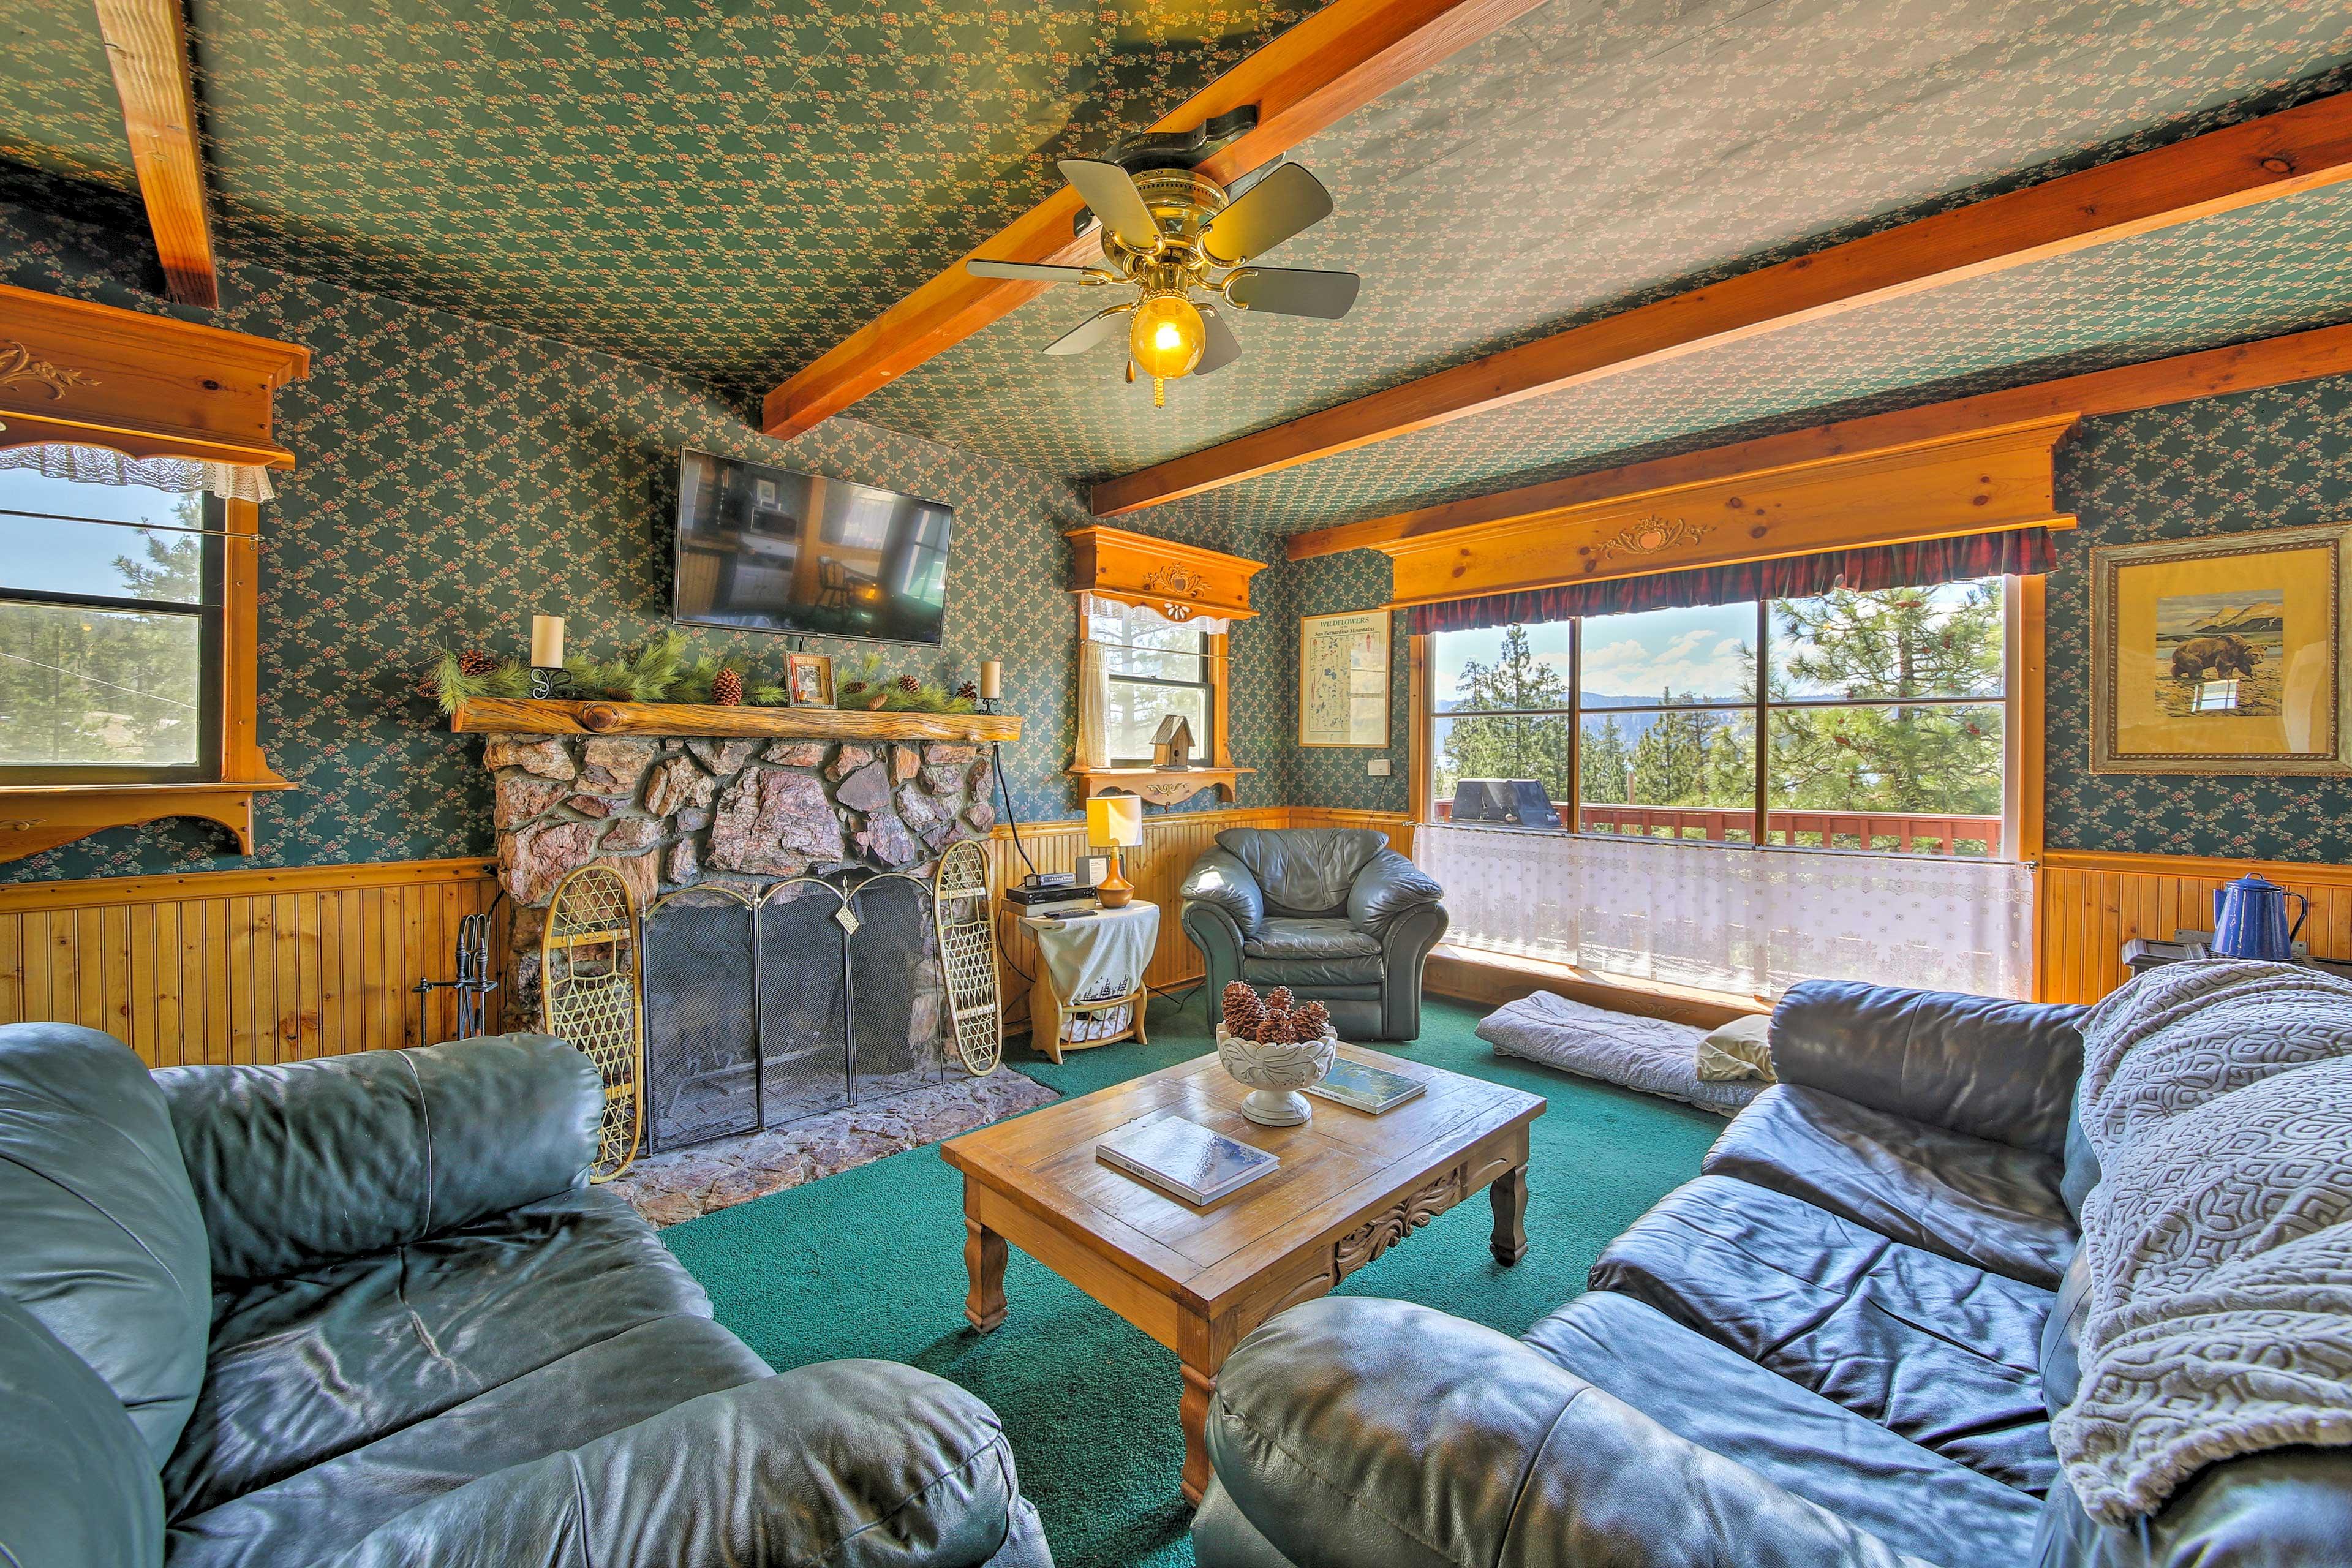 Unwind in this 1-bedroom, 1-bathroom vacation rental cabin in Fawnskin.